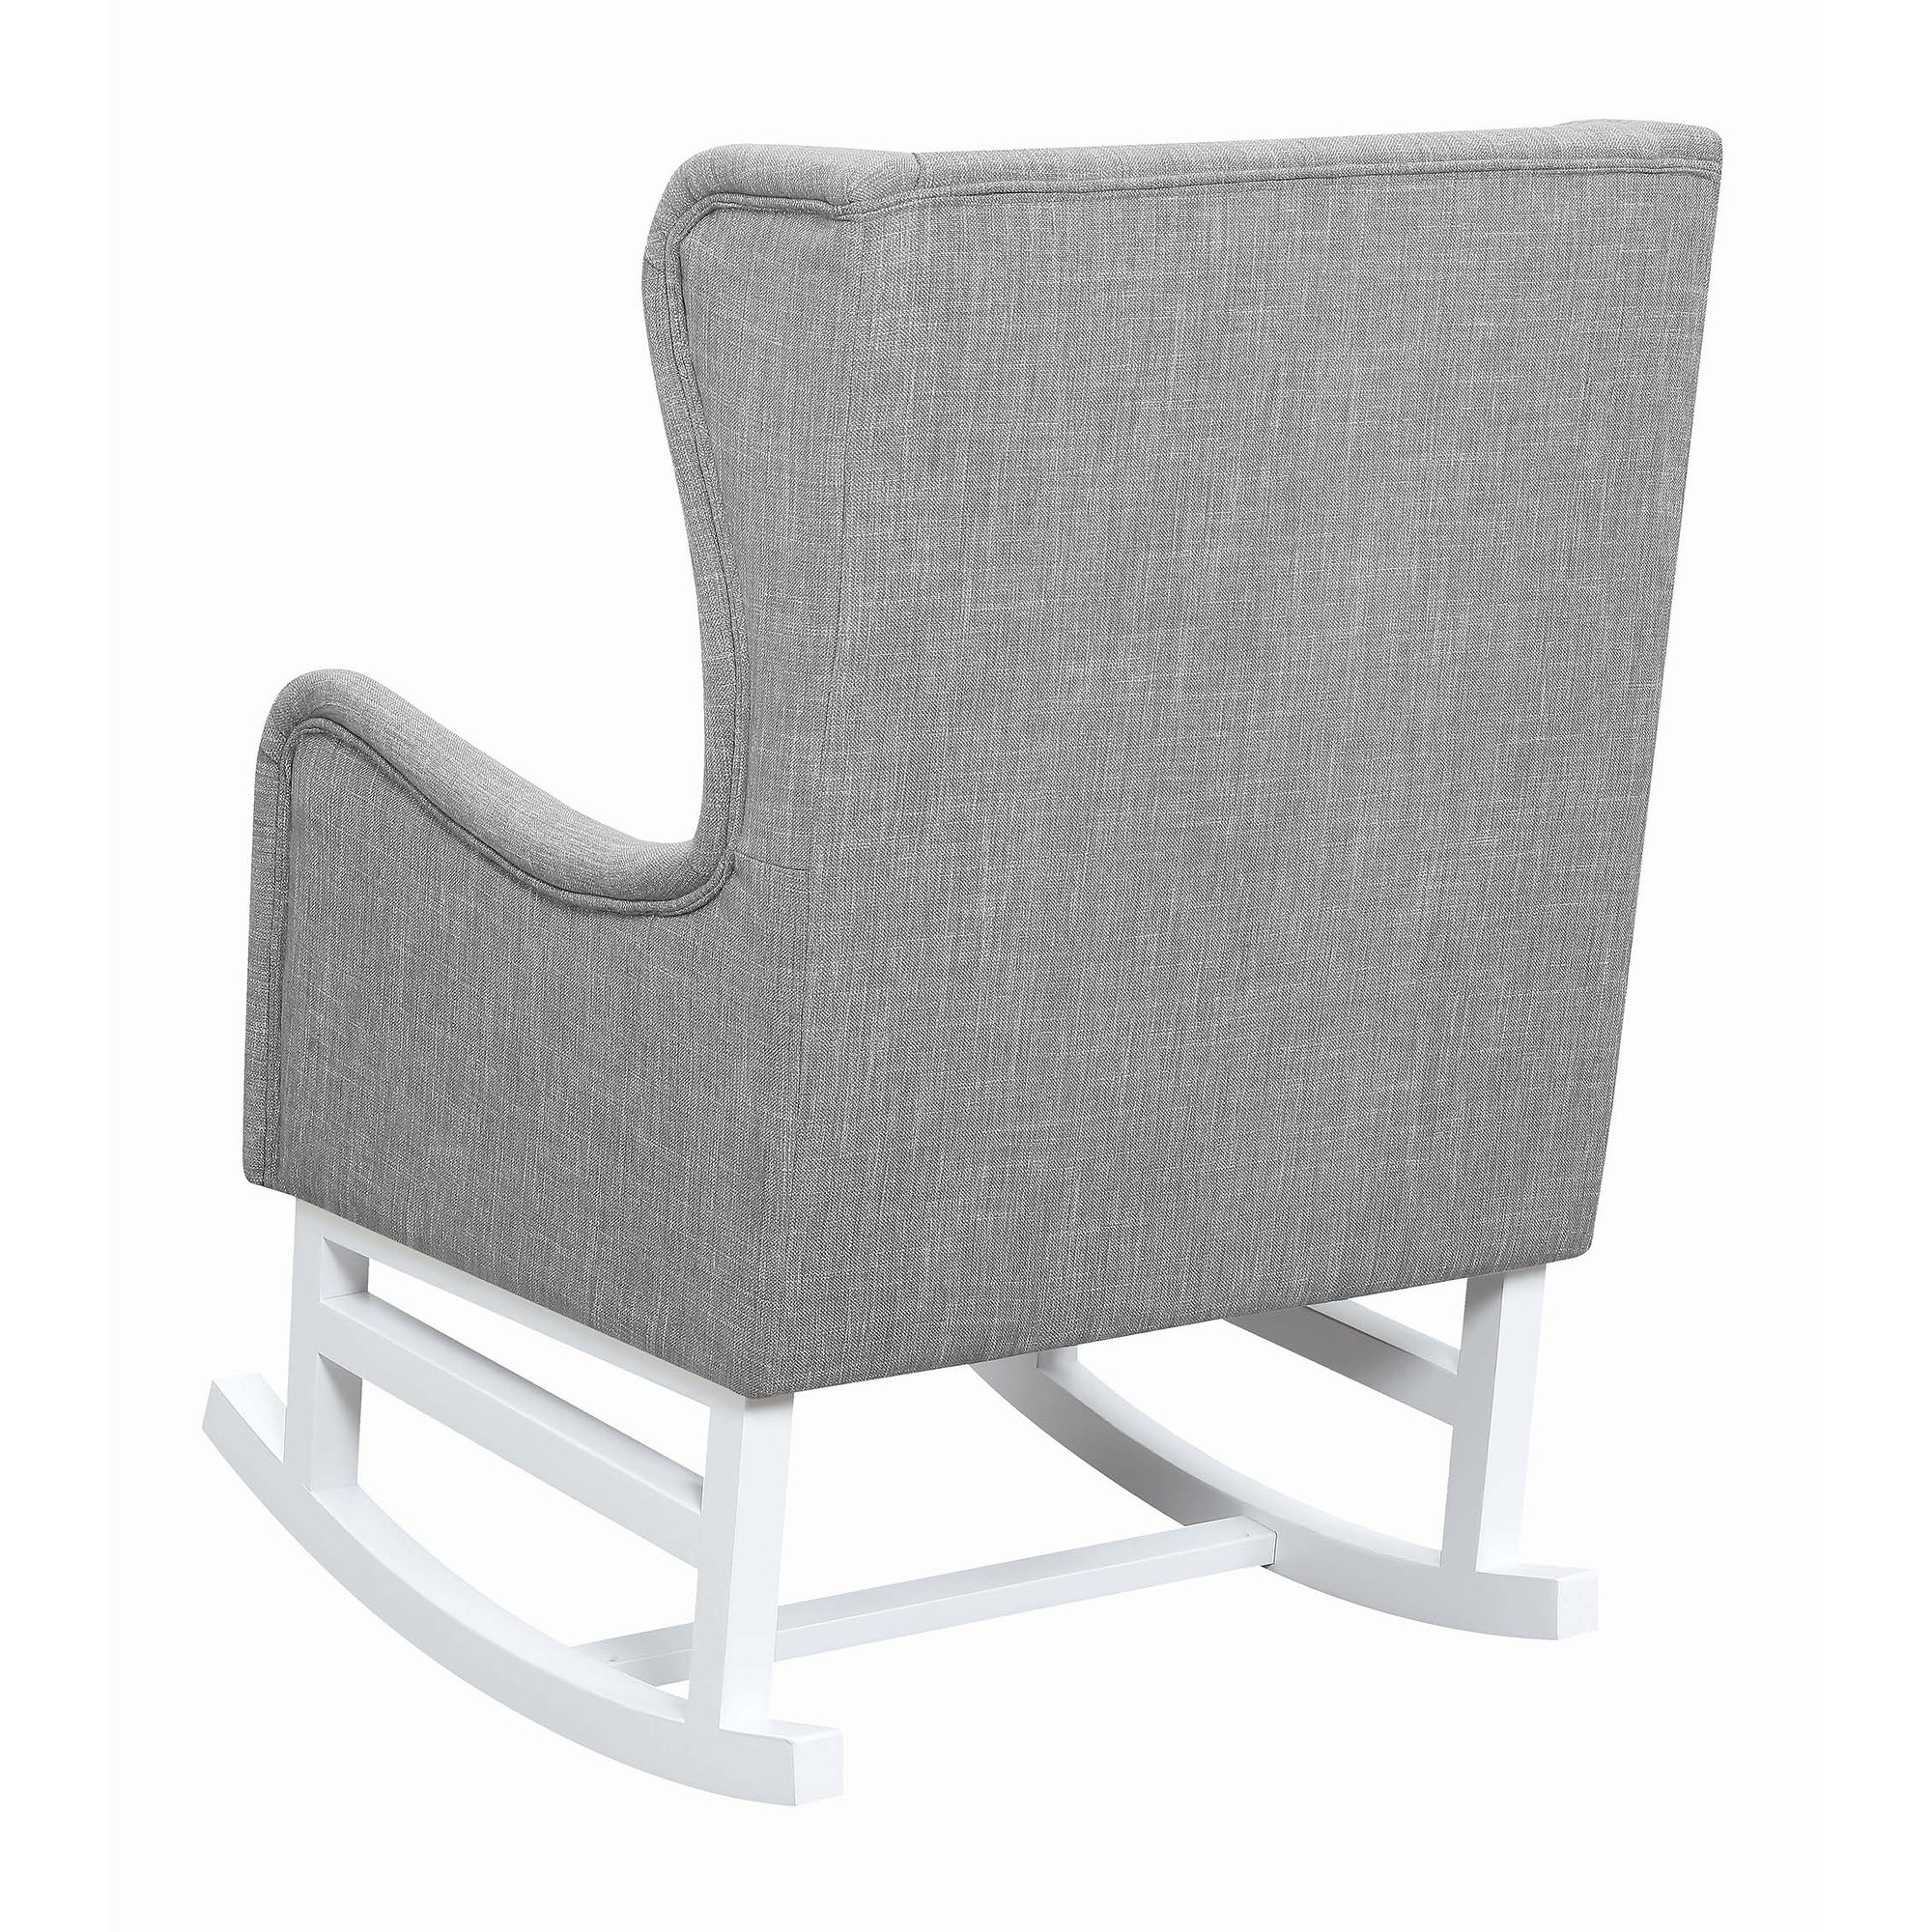 Coaster Natalia Upholstered Rocking Chair Grey